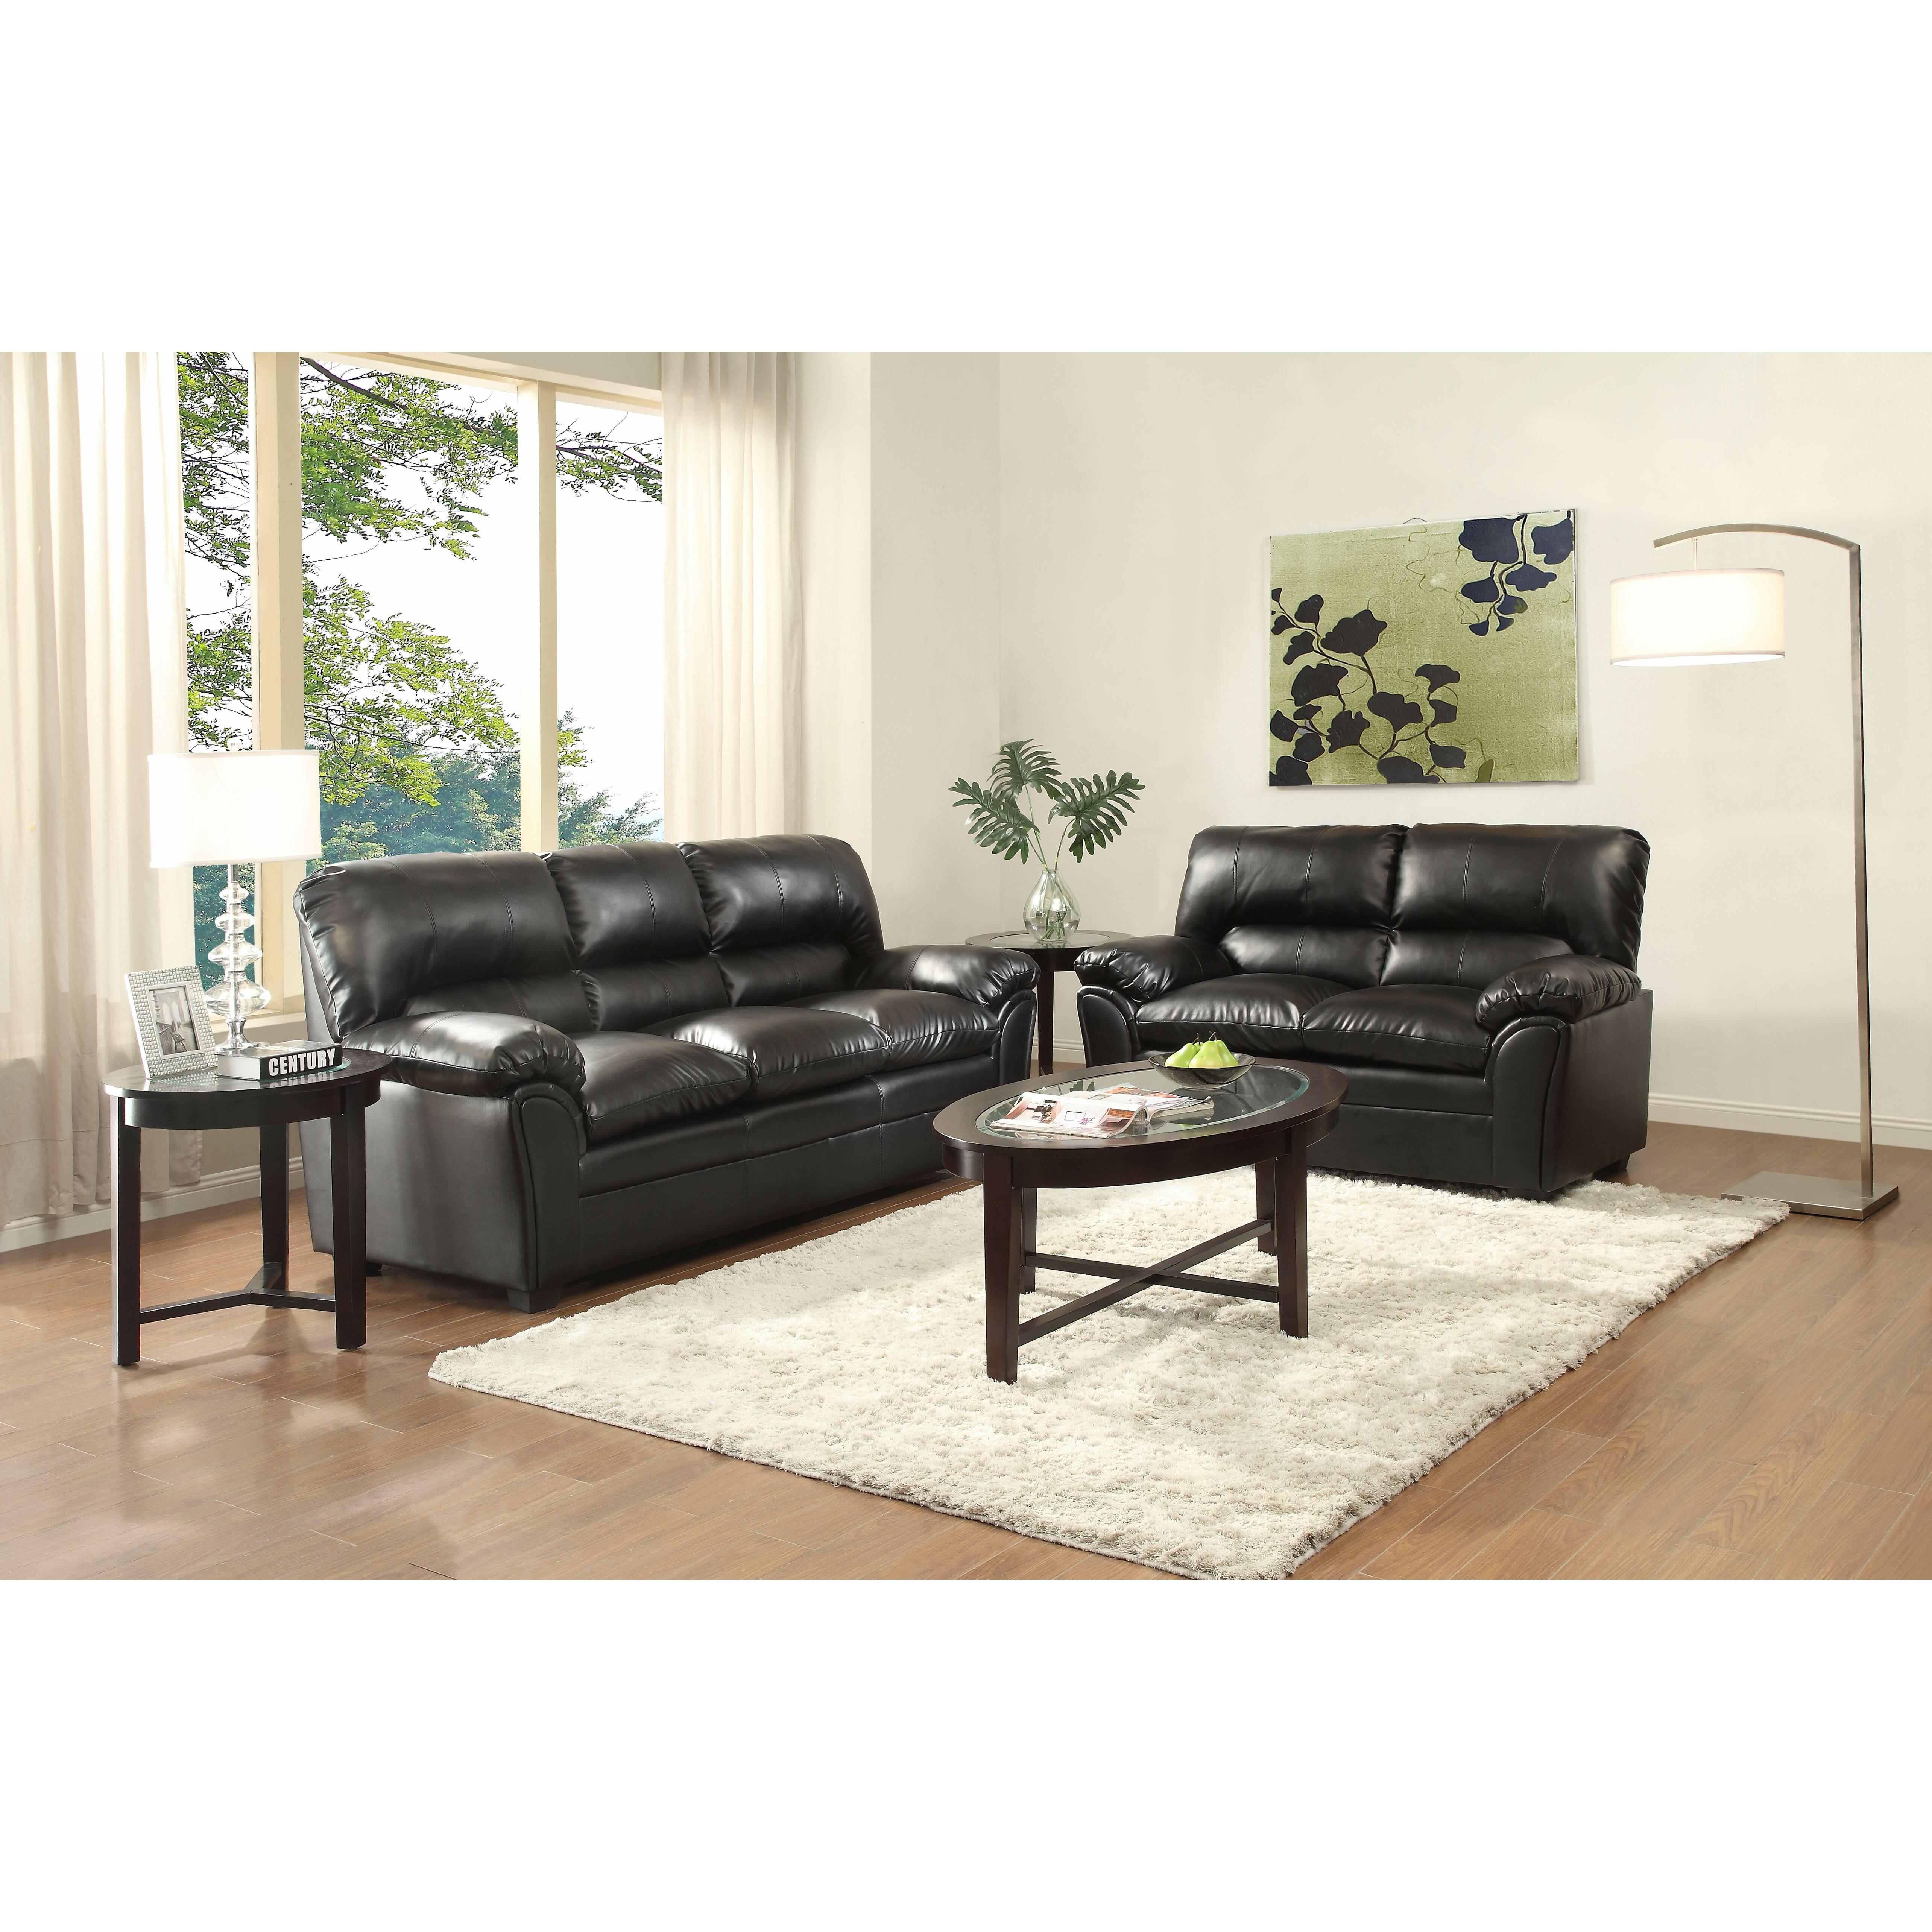 Woodhaven Living Room Furniture - Nagpurentrepreneurs